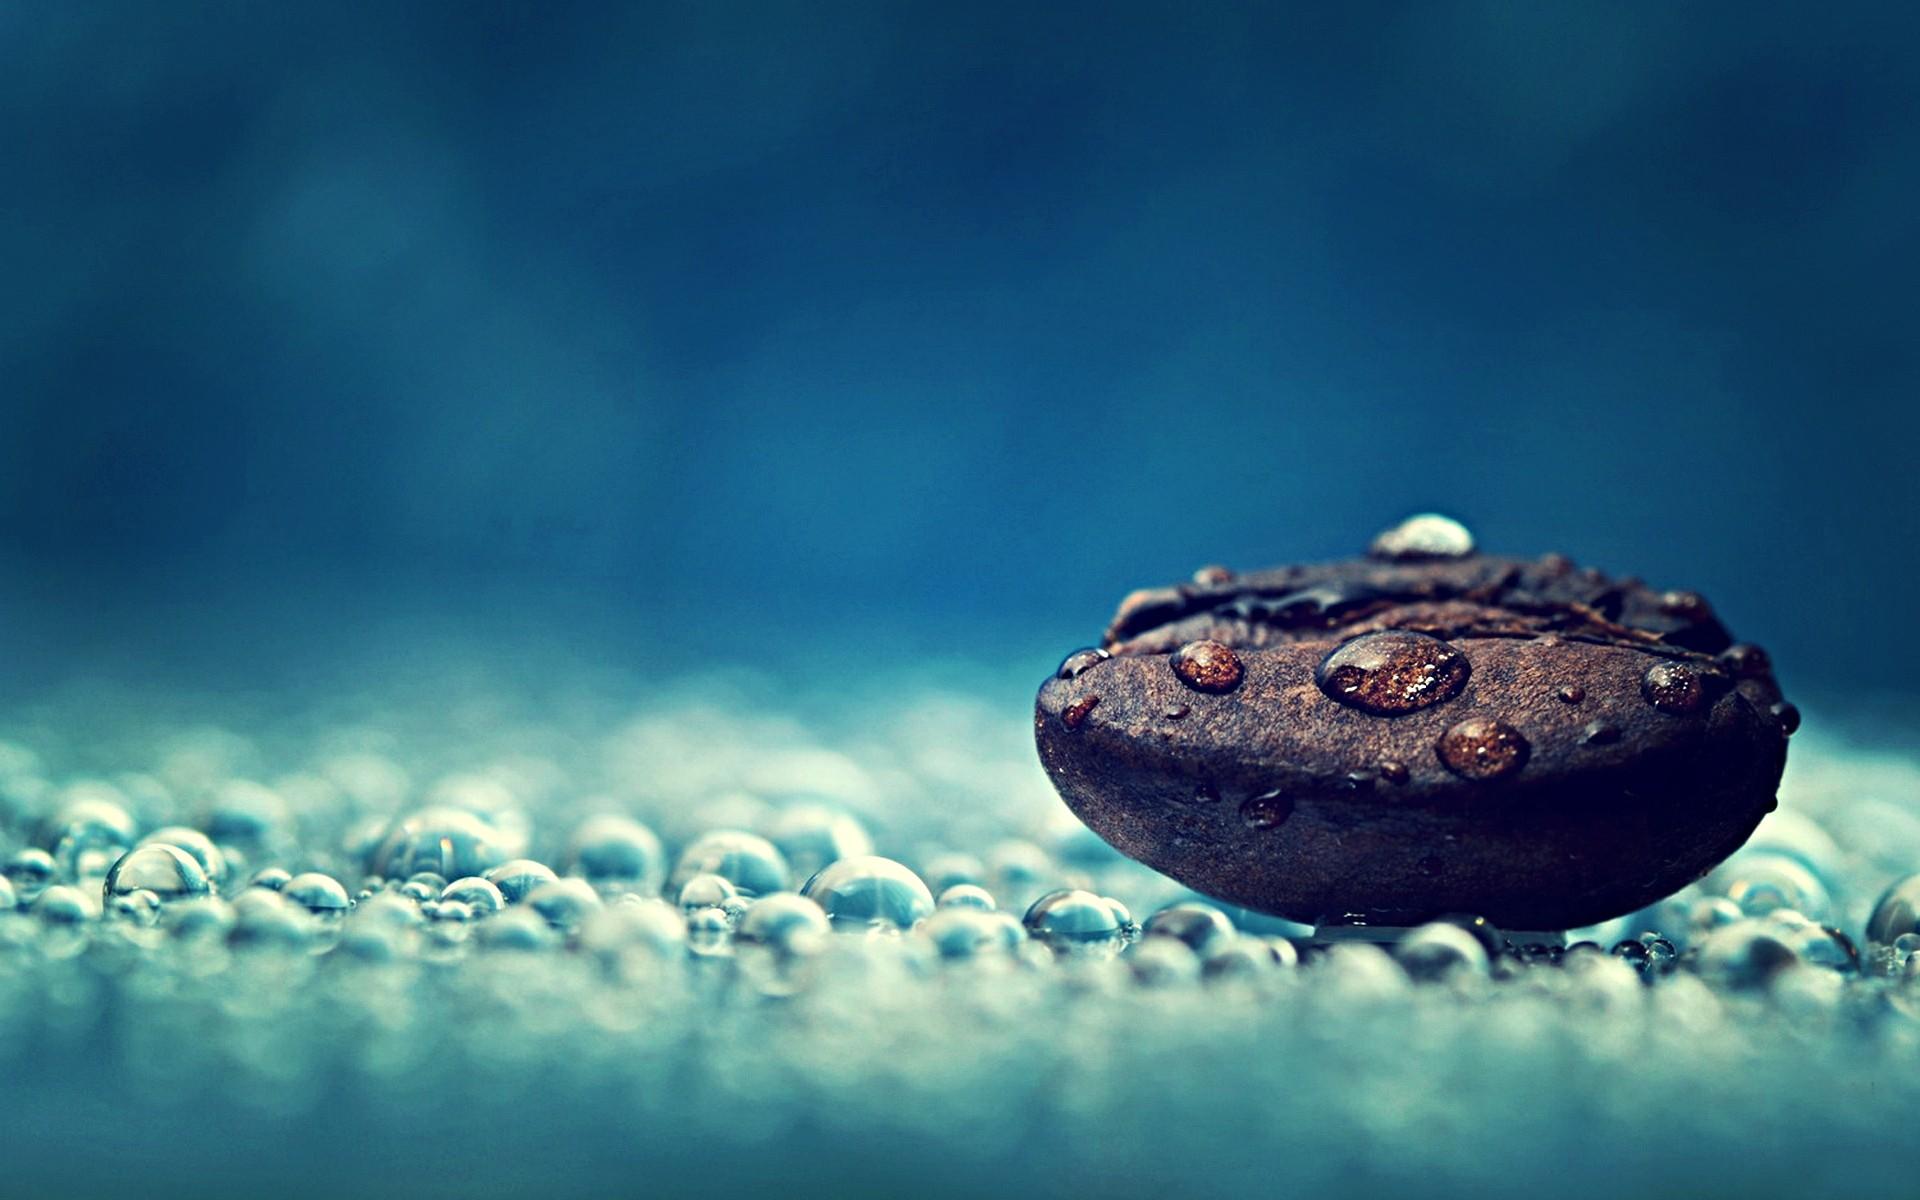 Coffee Photography Water Drops Macro Seeds Dew 74464 HD Wallpaper 1920x1200